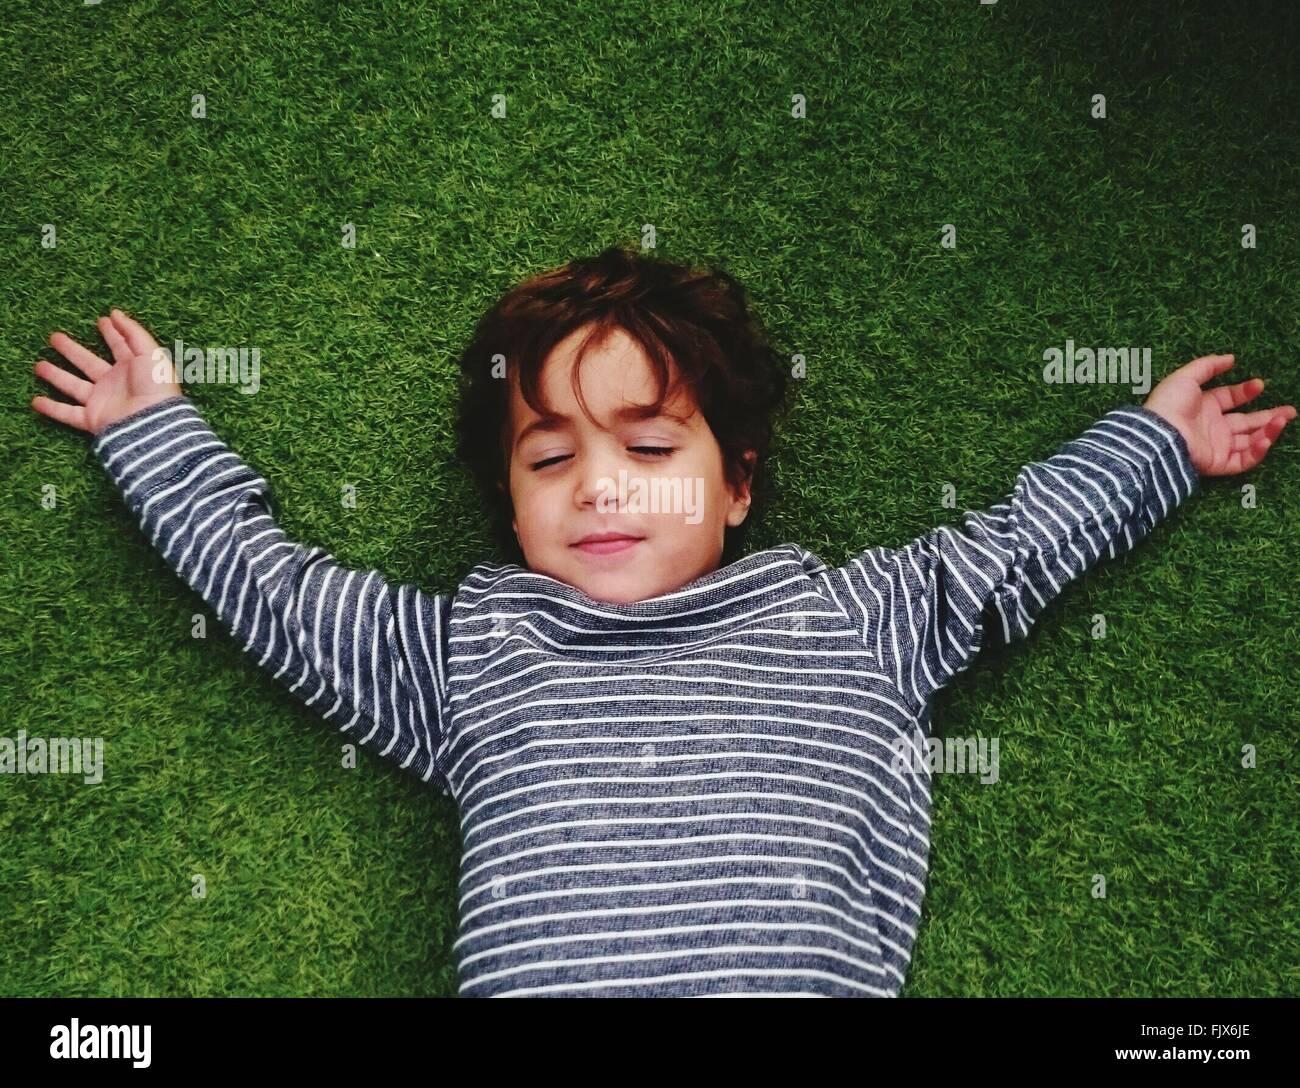 Portrait Of Cute Boy resting on Grassy Field Photo Stock